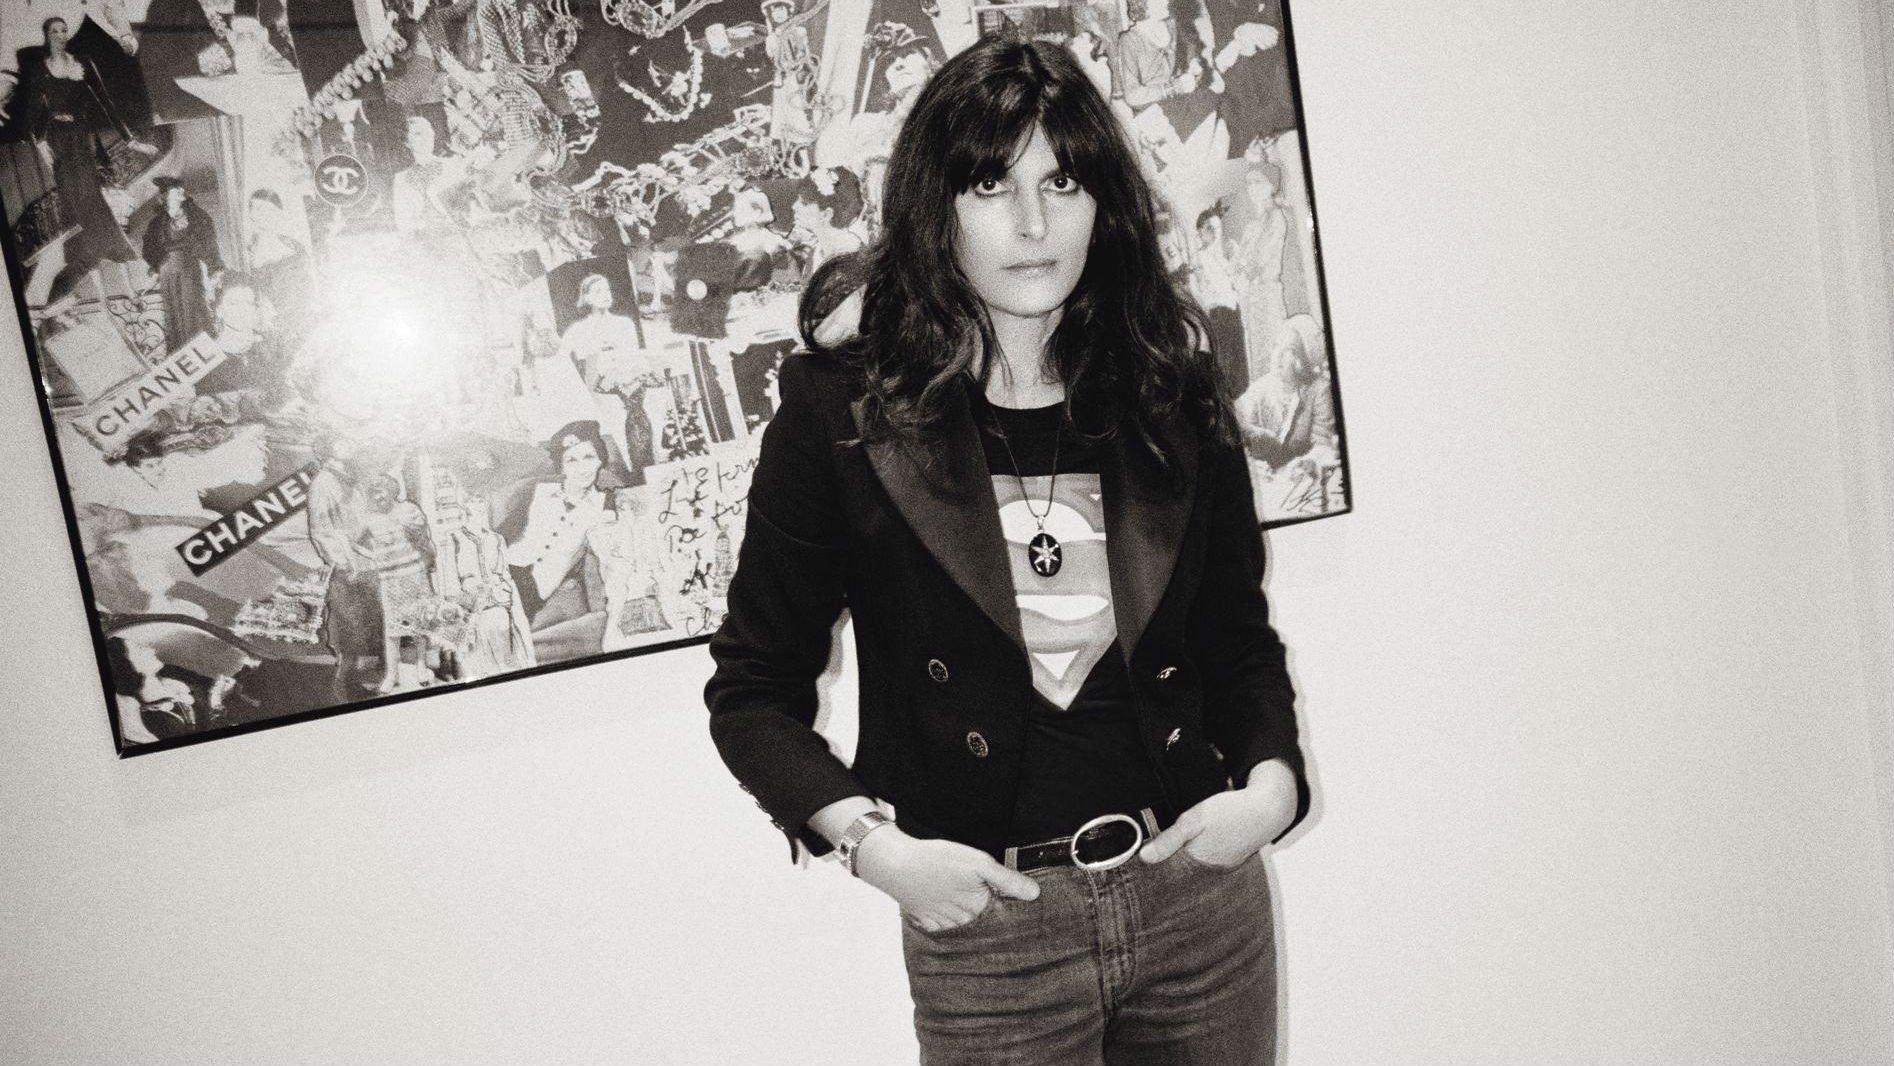 Virginie Viard sucesora de Karl Lagerfeld en Chanel Virgine Viard